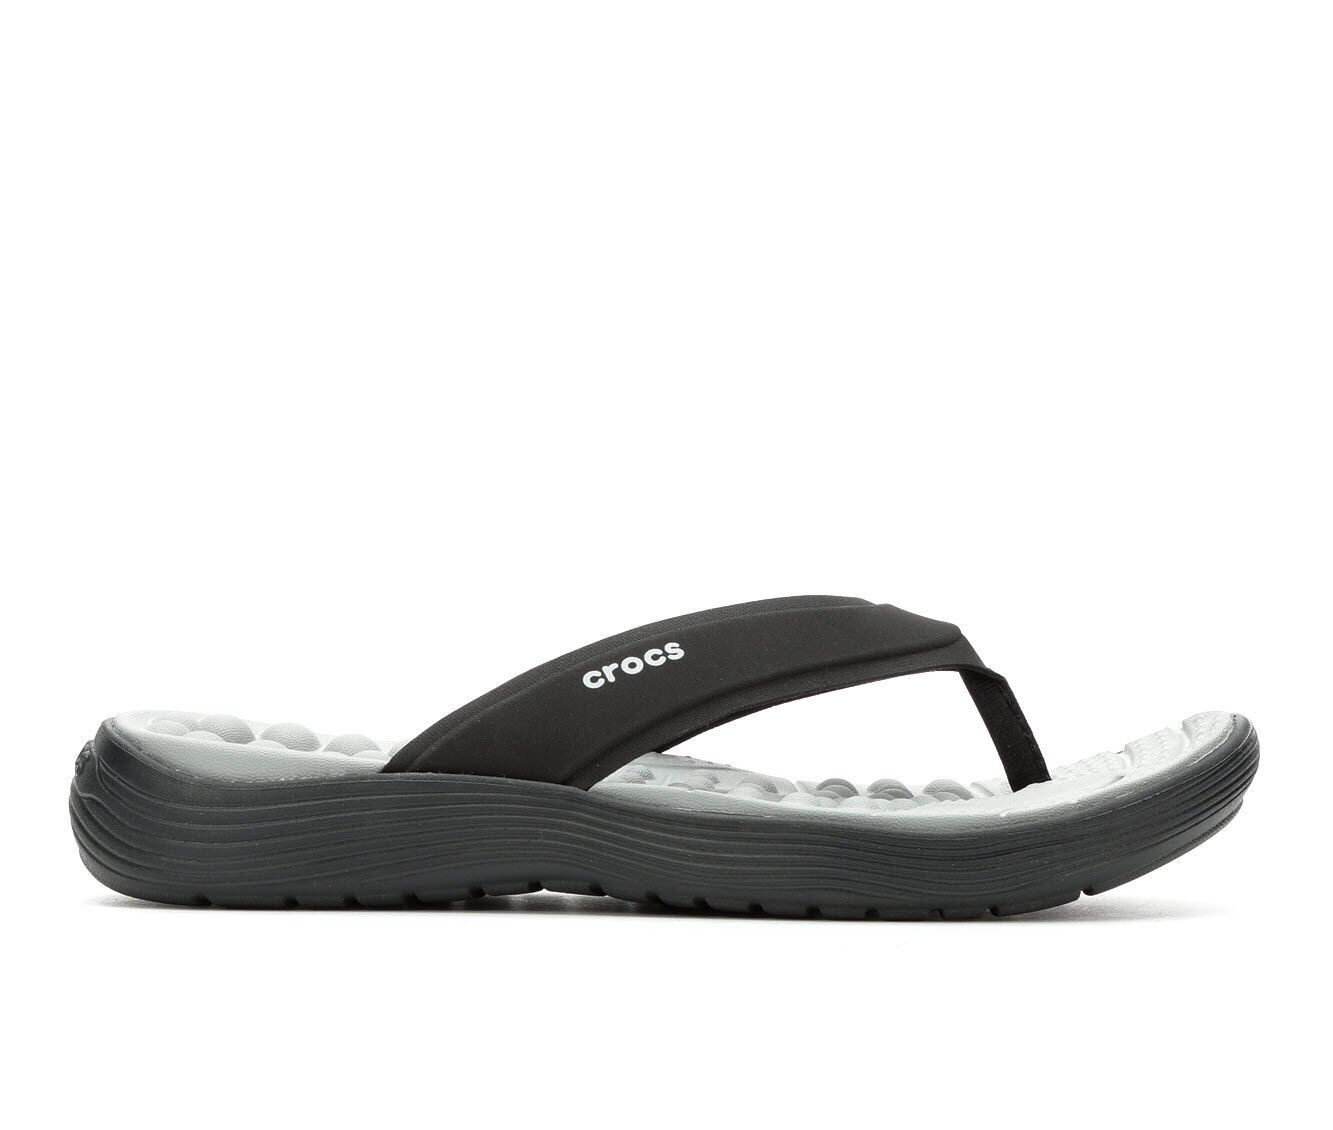 authentic store Women's Crocs Reviva Flip-Flops Black/Black